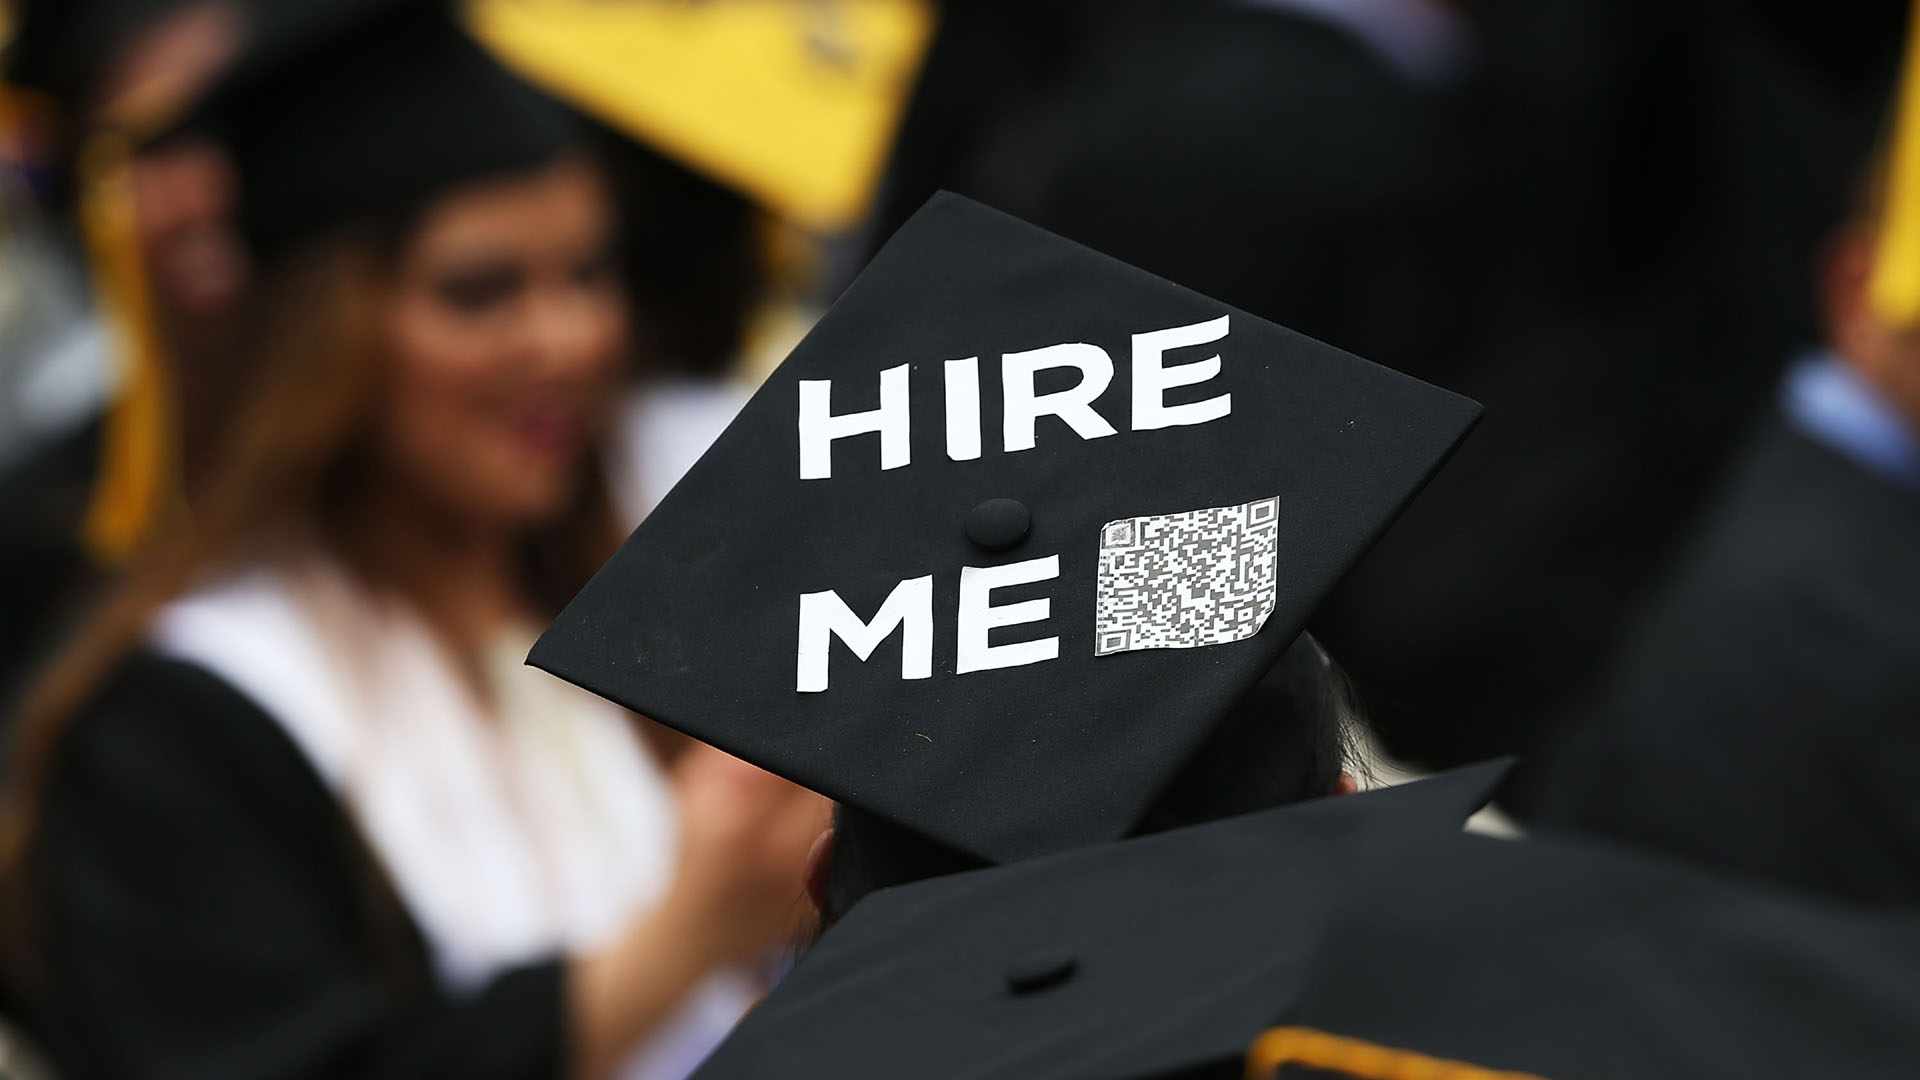 Hire Me college graduation students88406381-159532